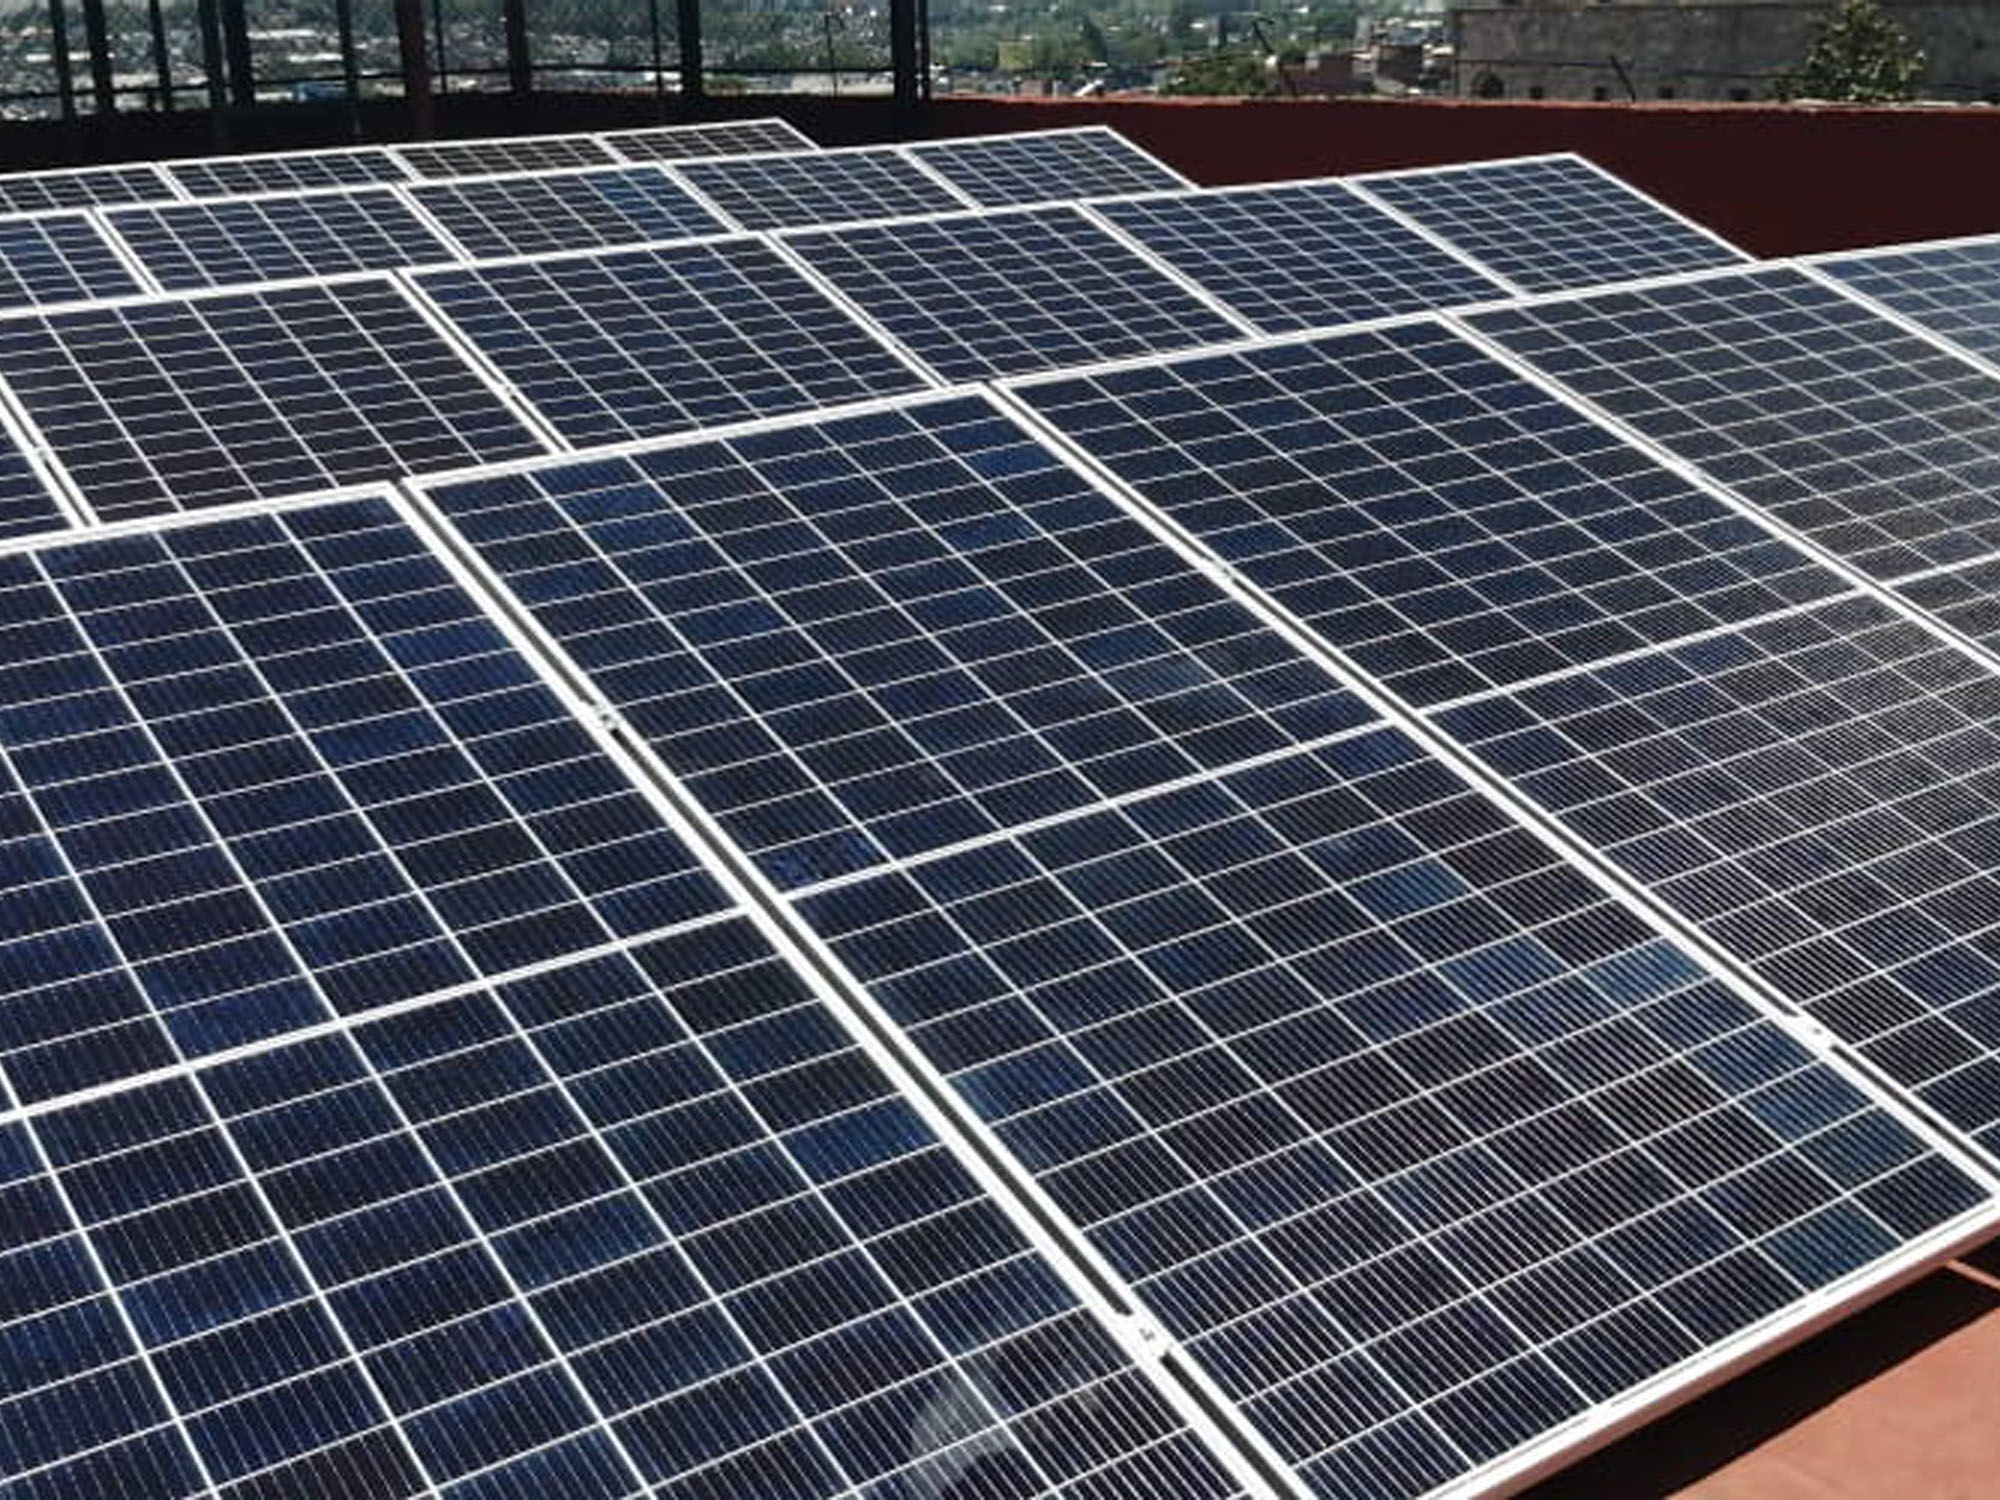 Placas solares en escuela México